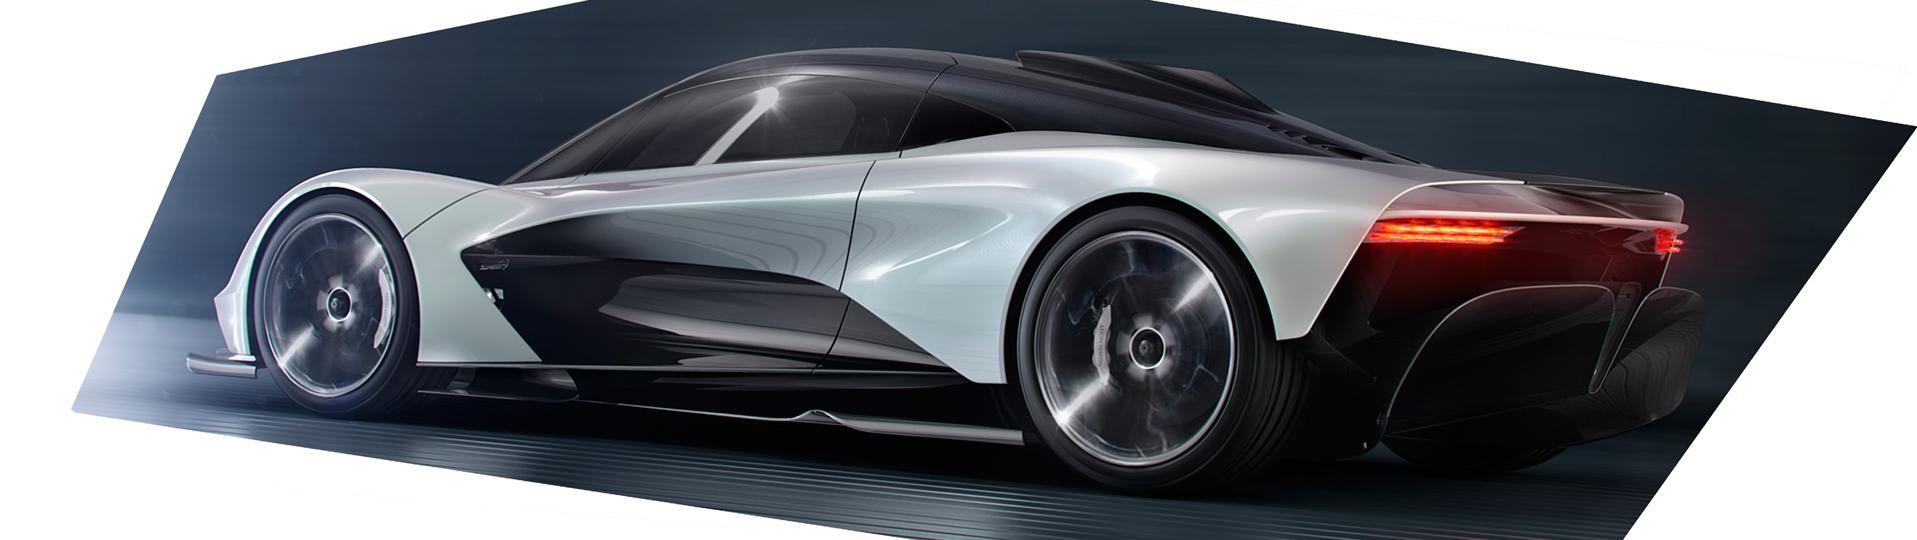 Aston-martin-RB-003